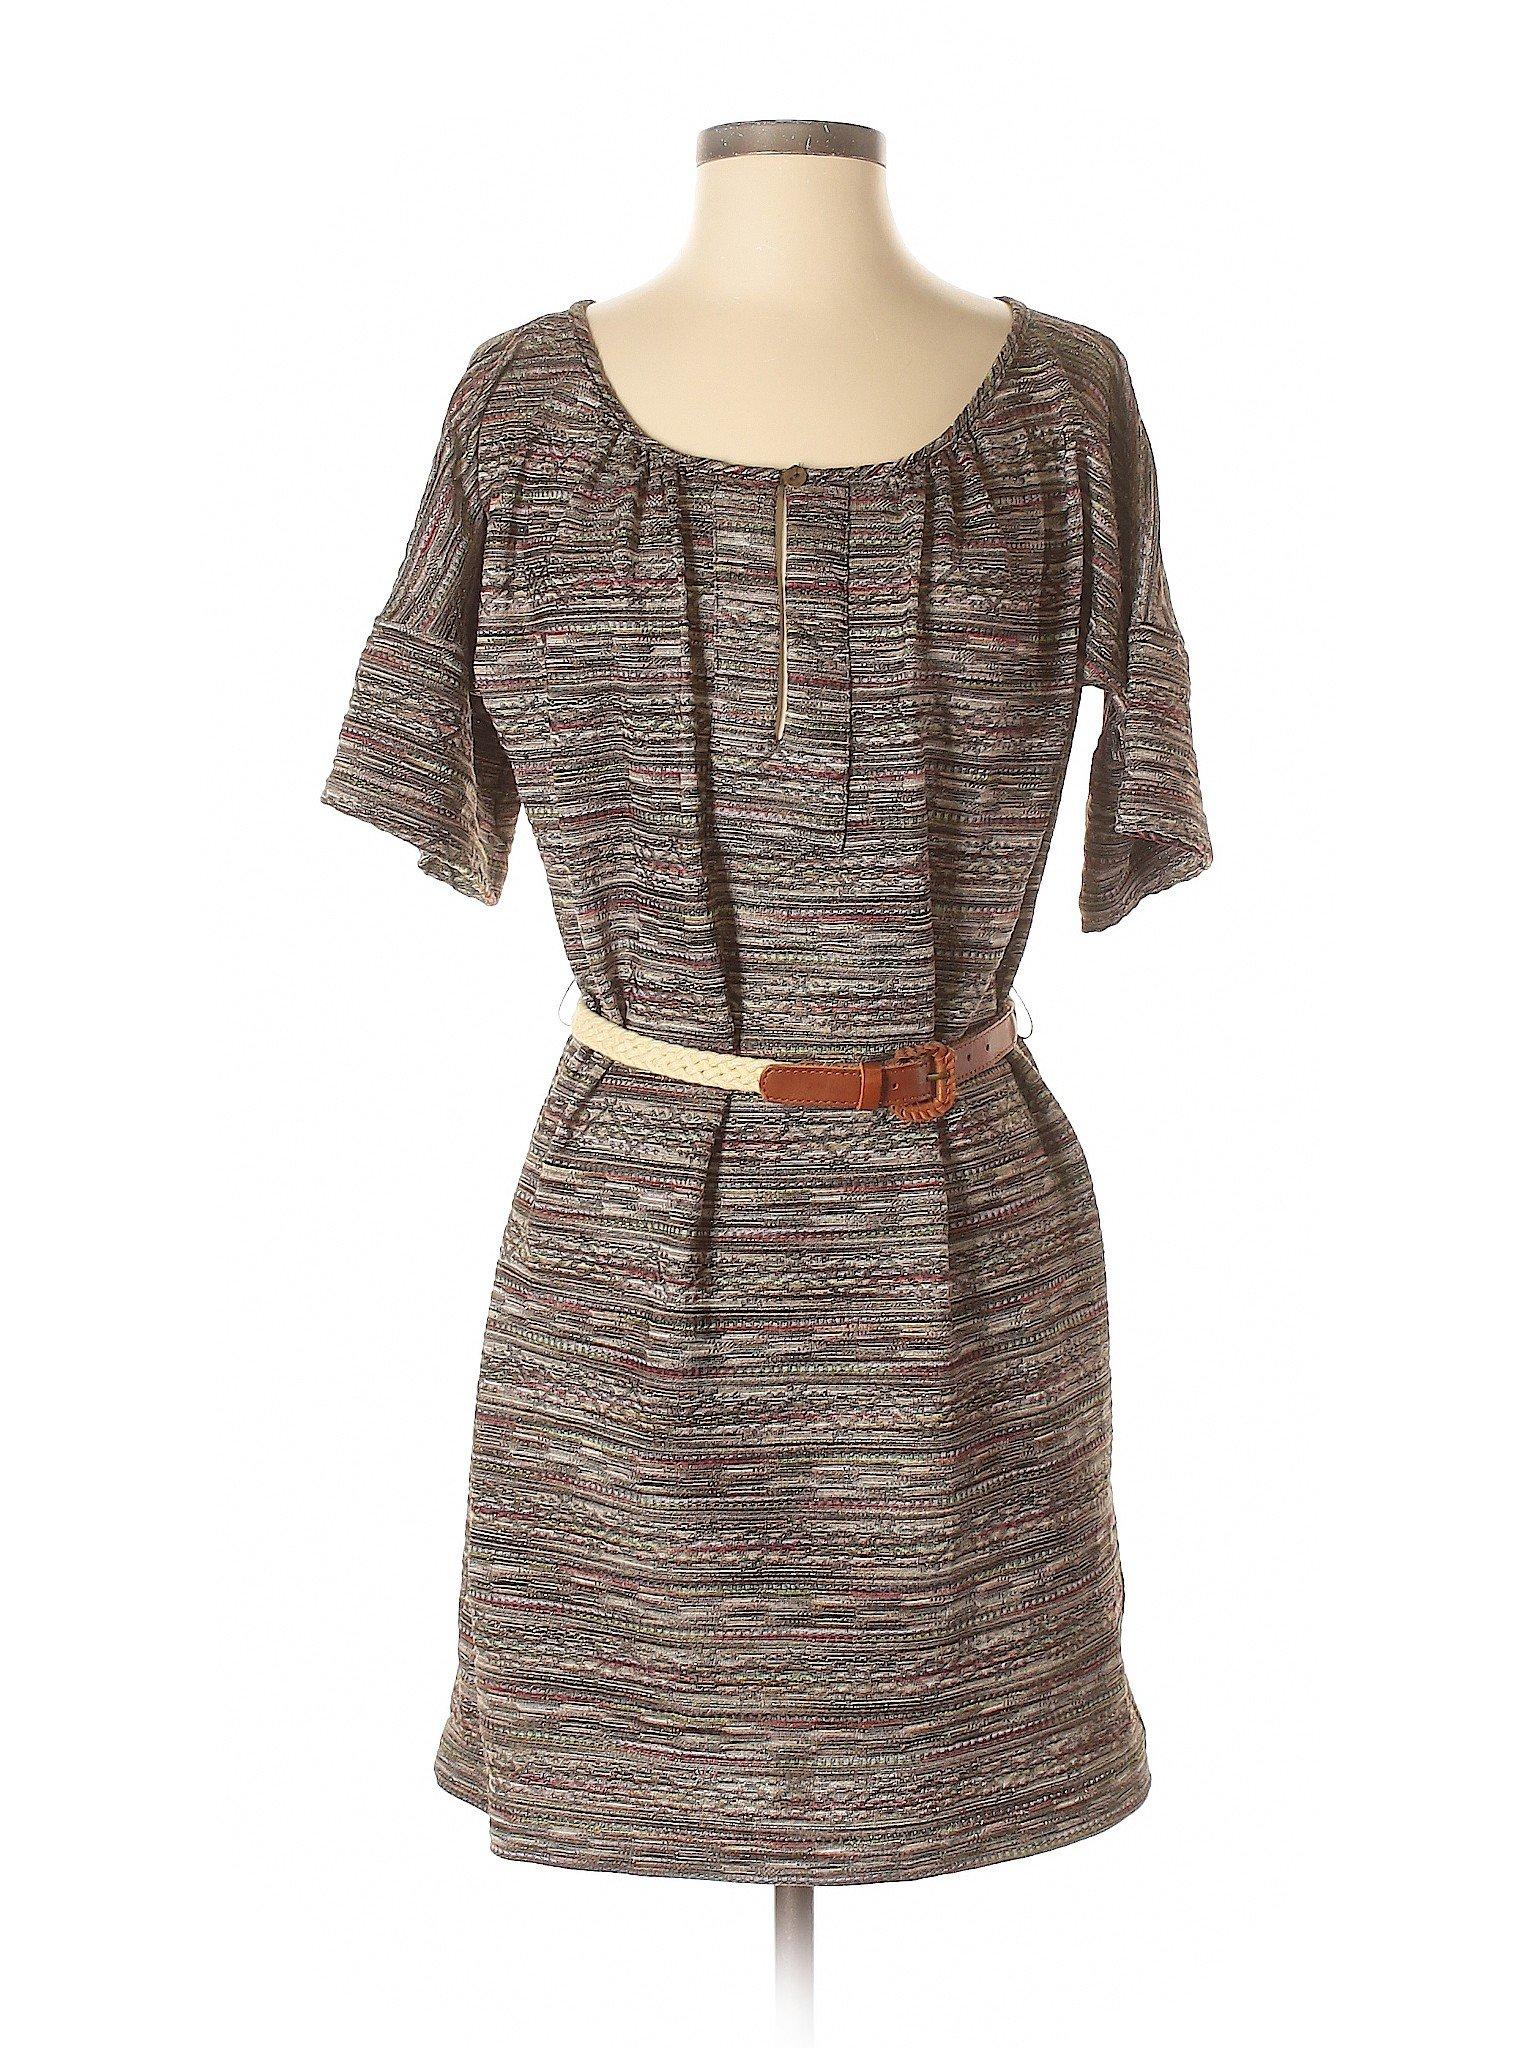 Kincaid Boutique J Dress Casual winter Patterson HrAqwtr